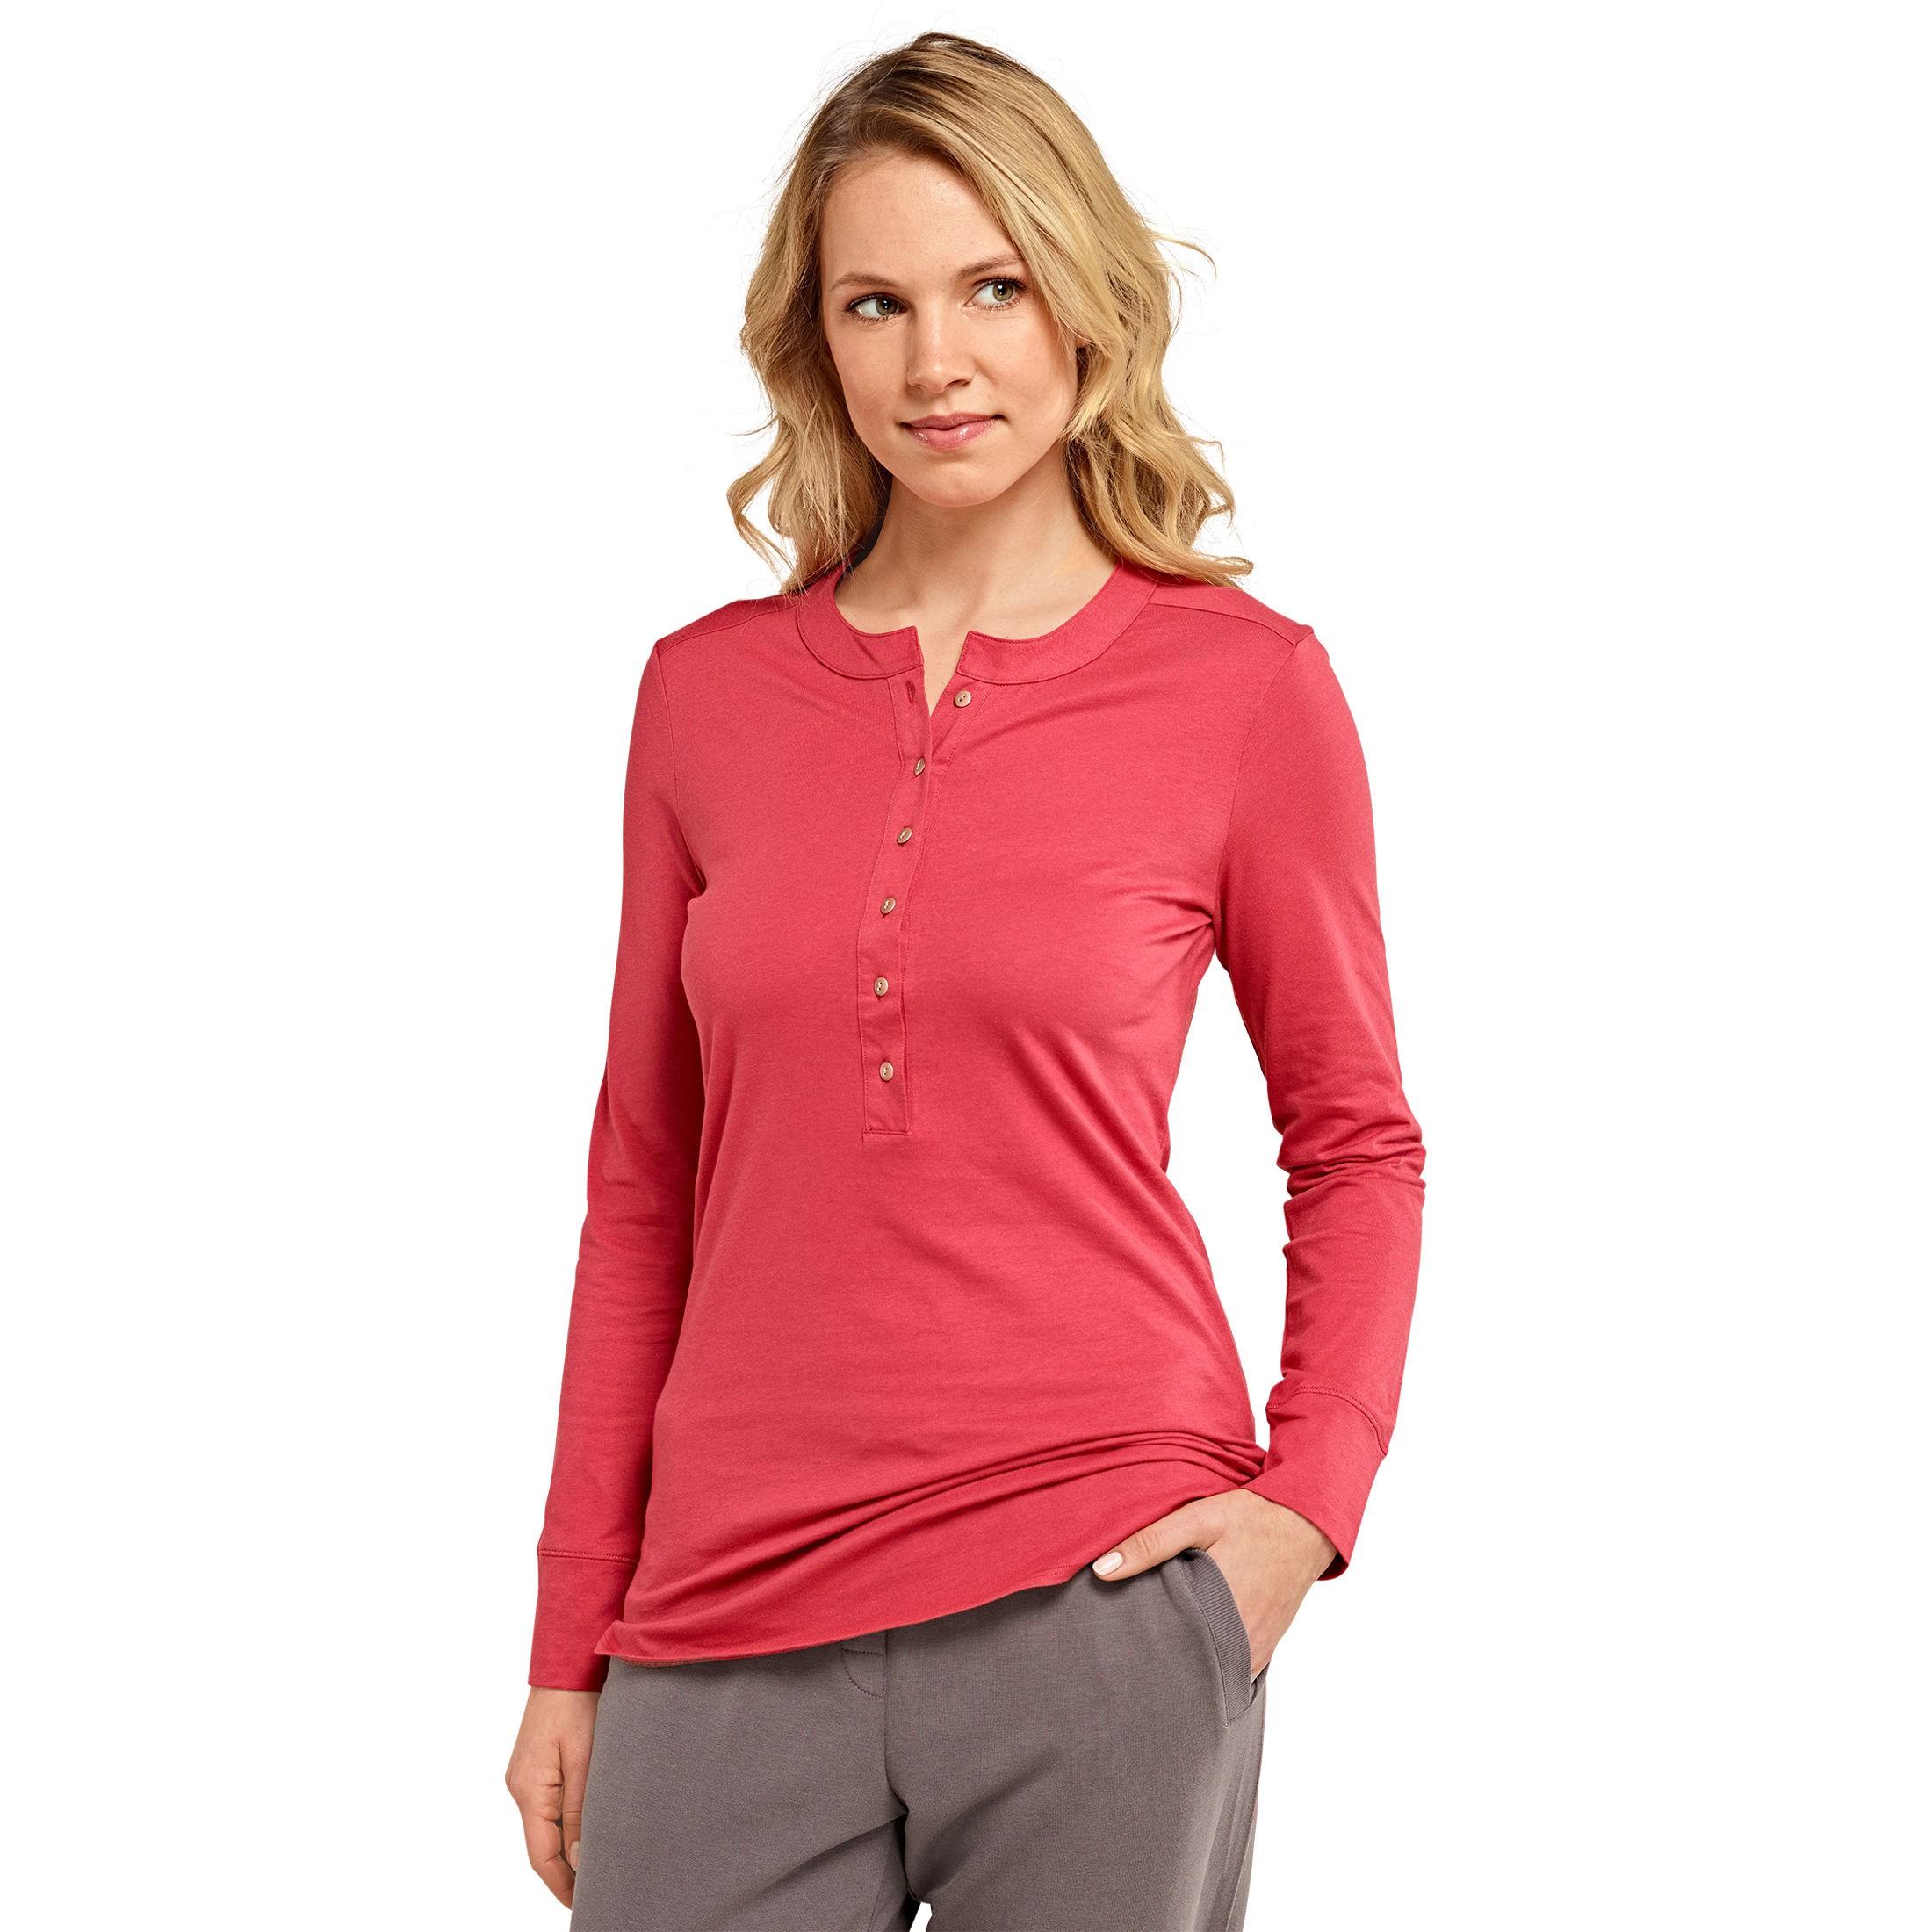 SCHIESSER Damen Langarmshirt Single-Jersey Baumwolle mit Knopfleiste rot  Mix   Relax 43995821bd